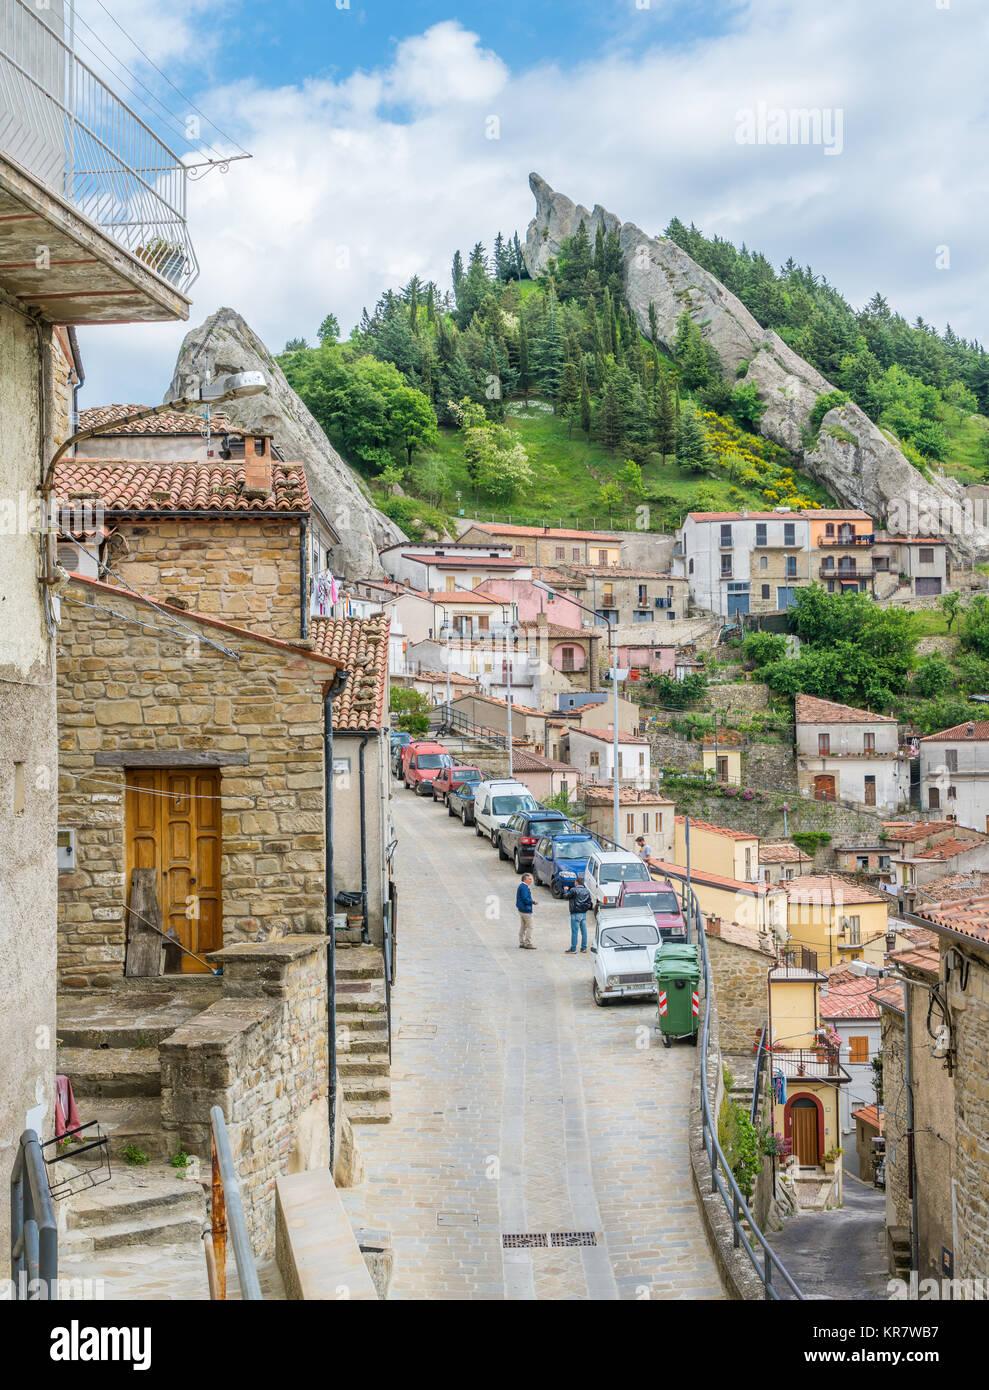 Scenic sight in Pietrapertosa, small village on the Lucanian Dolomites, province of Potenza, Basilicata, Italy. Stock Photo